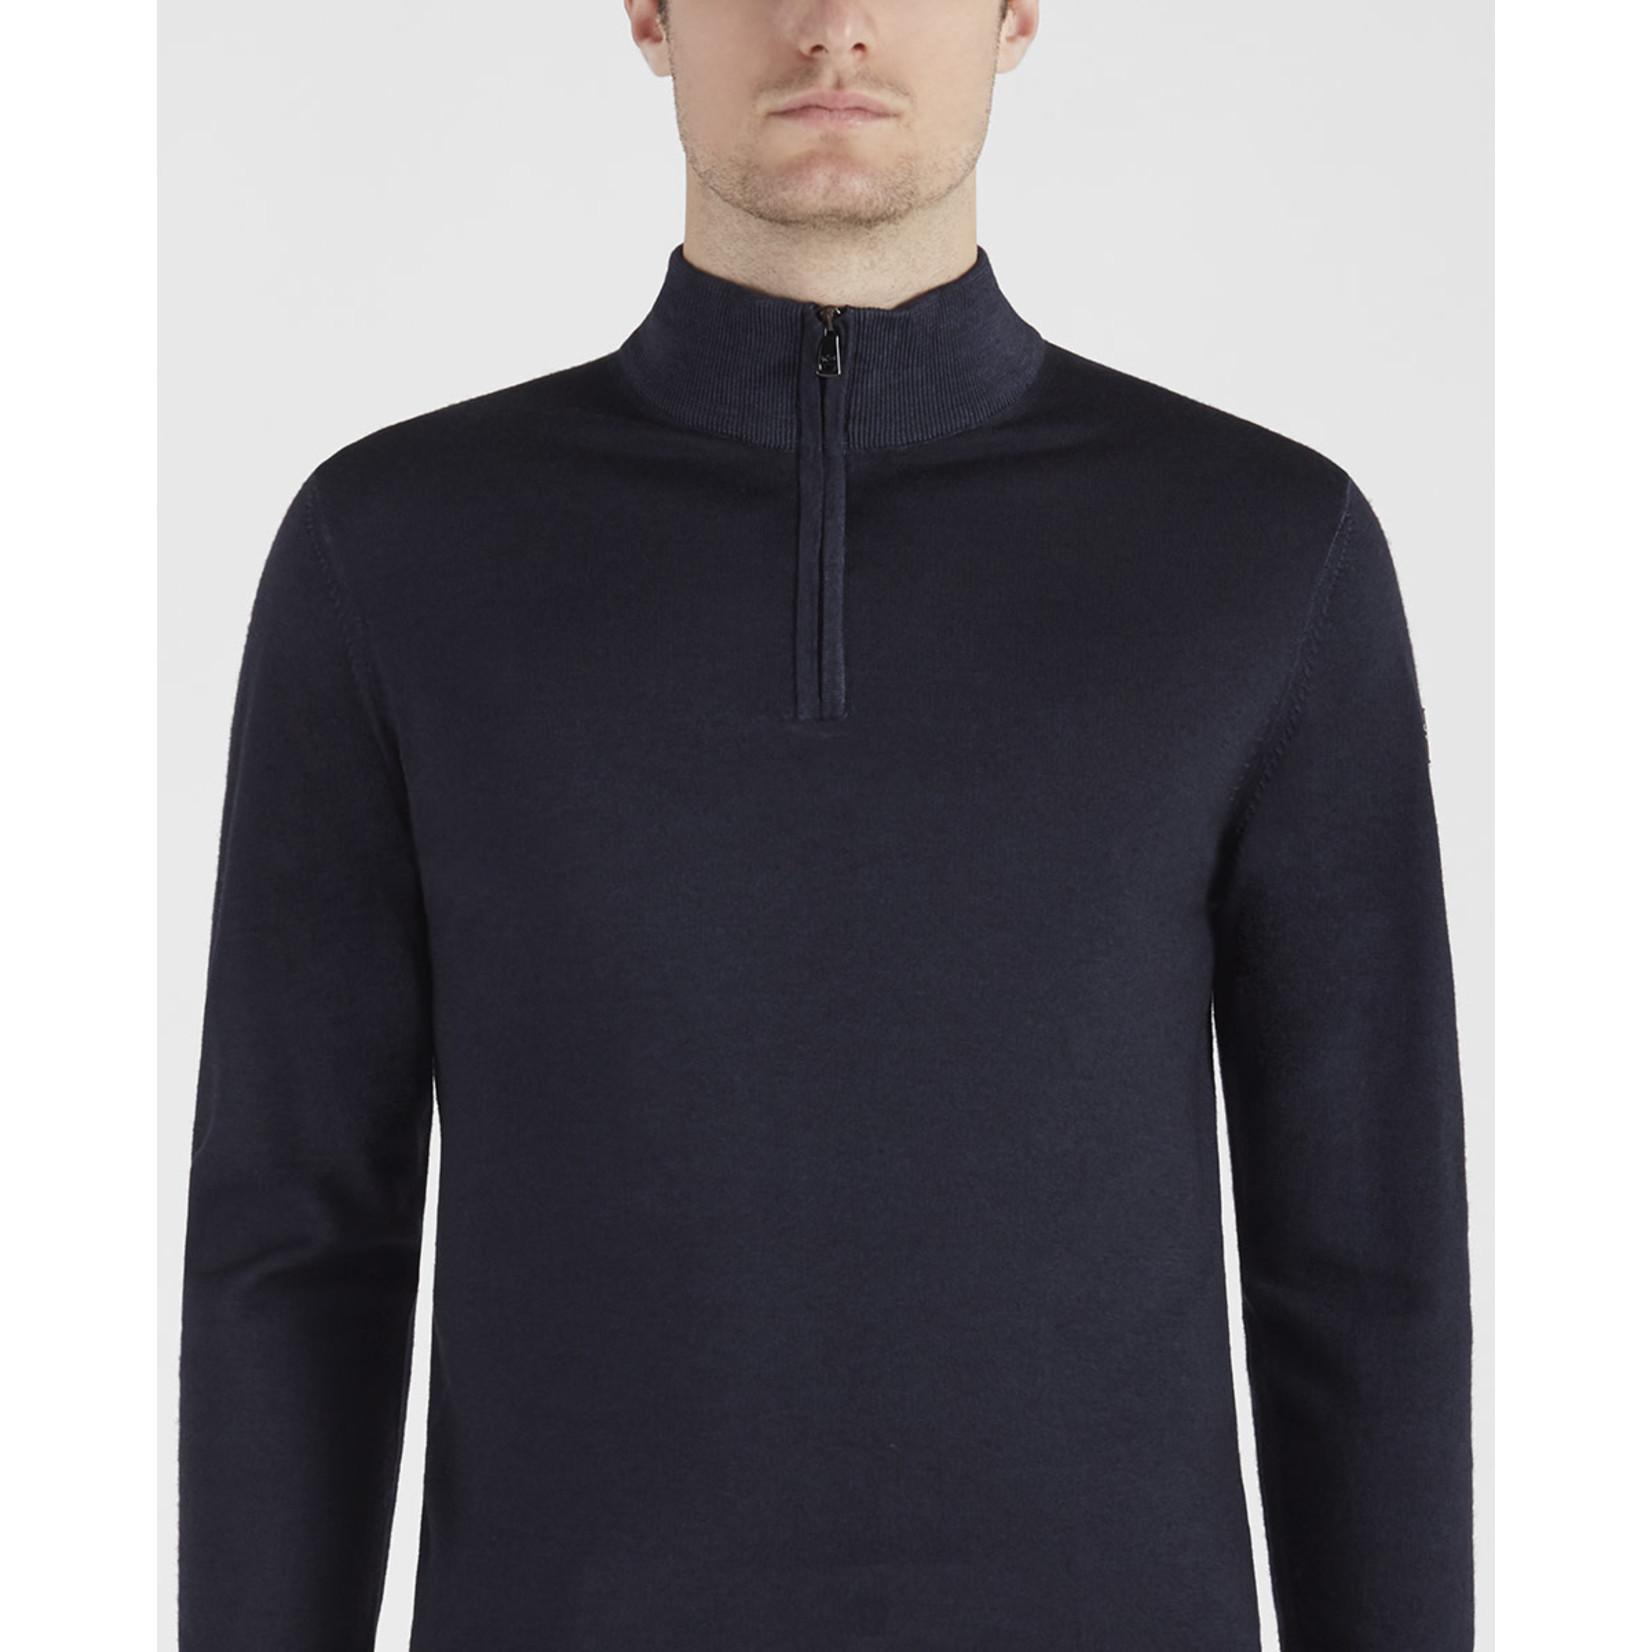 Paul & Shark zip pullover marine